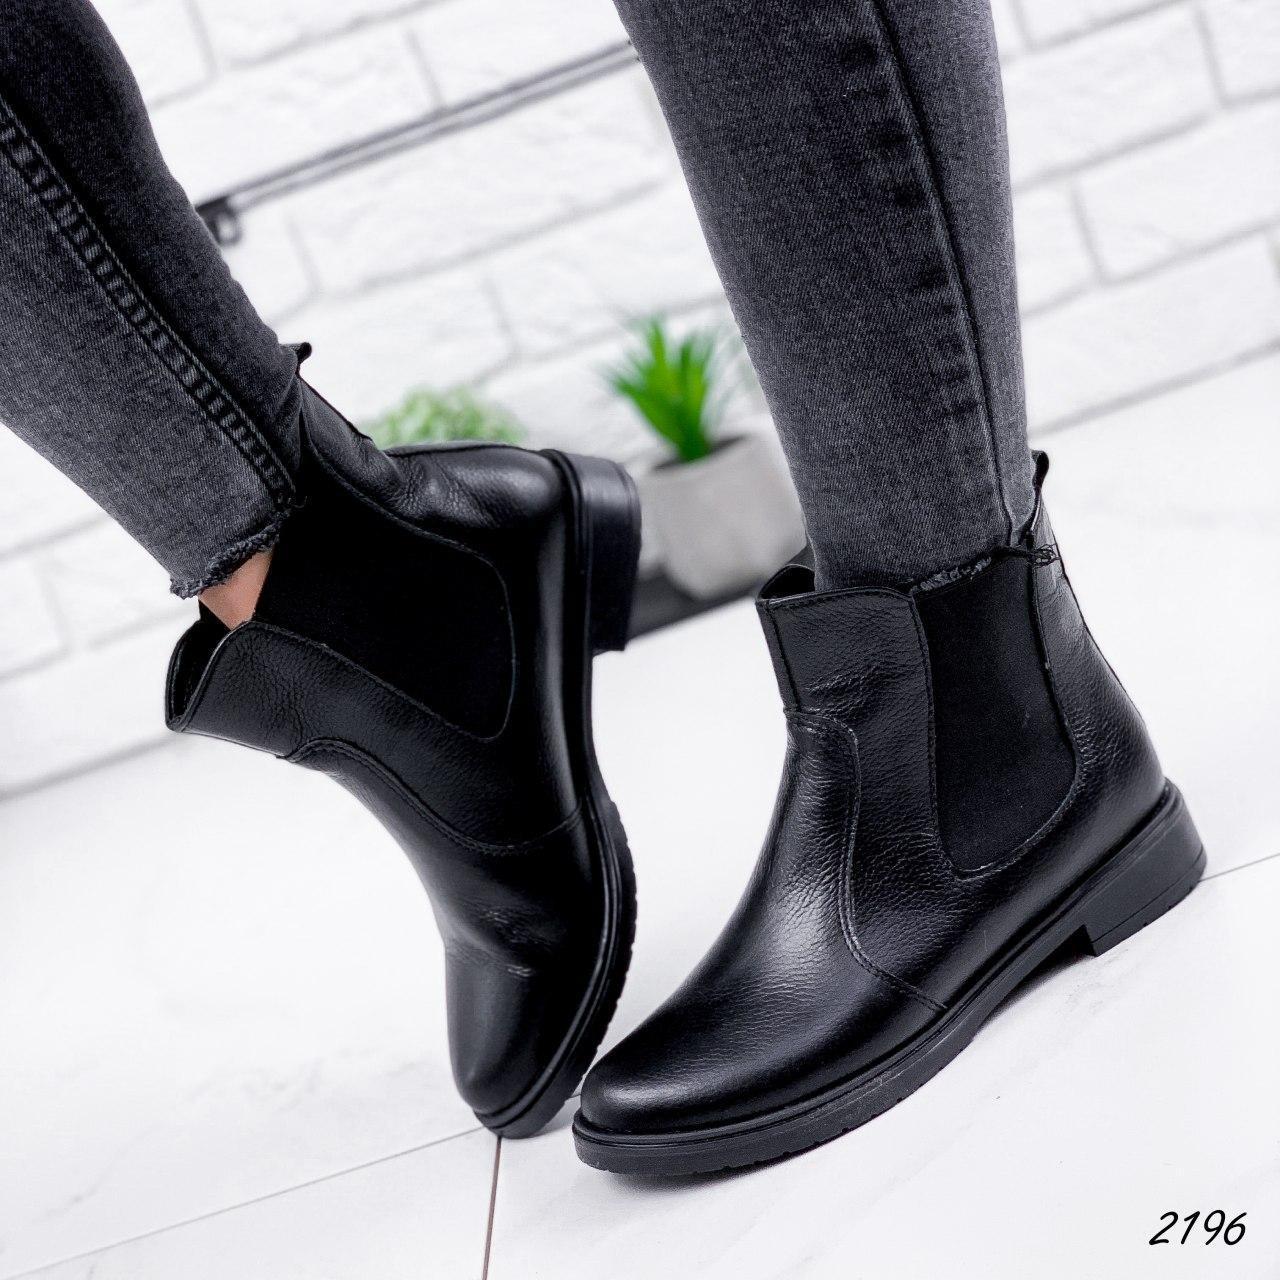 Ботинки женские черные, демисезонные из НАТУРАЛЬНОЙ КОЖИ. Черевики жіночі чорні з натуральної шкіри утеплені